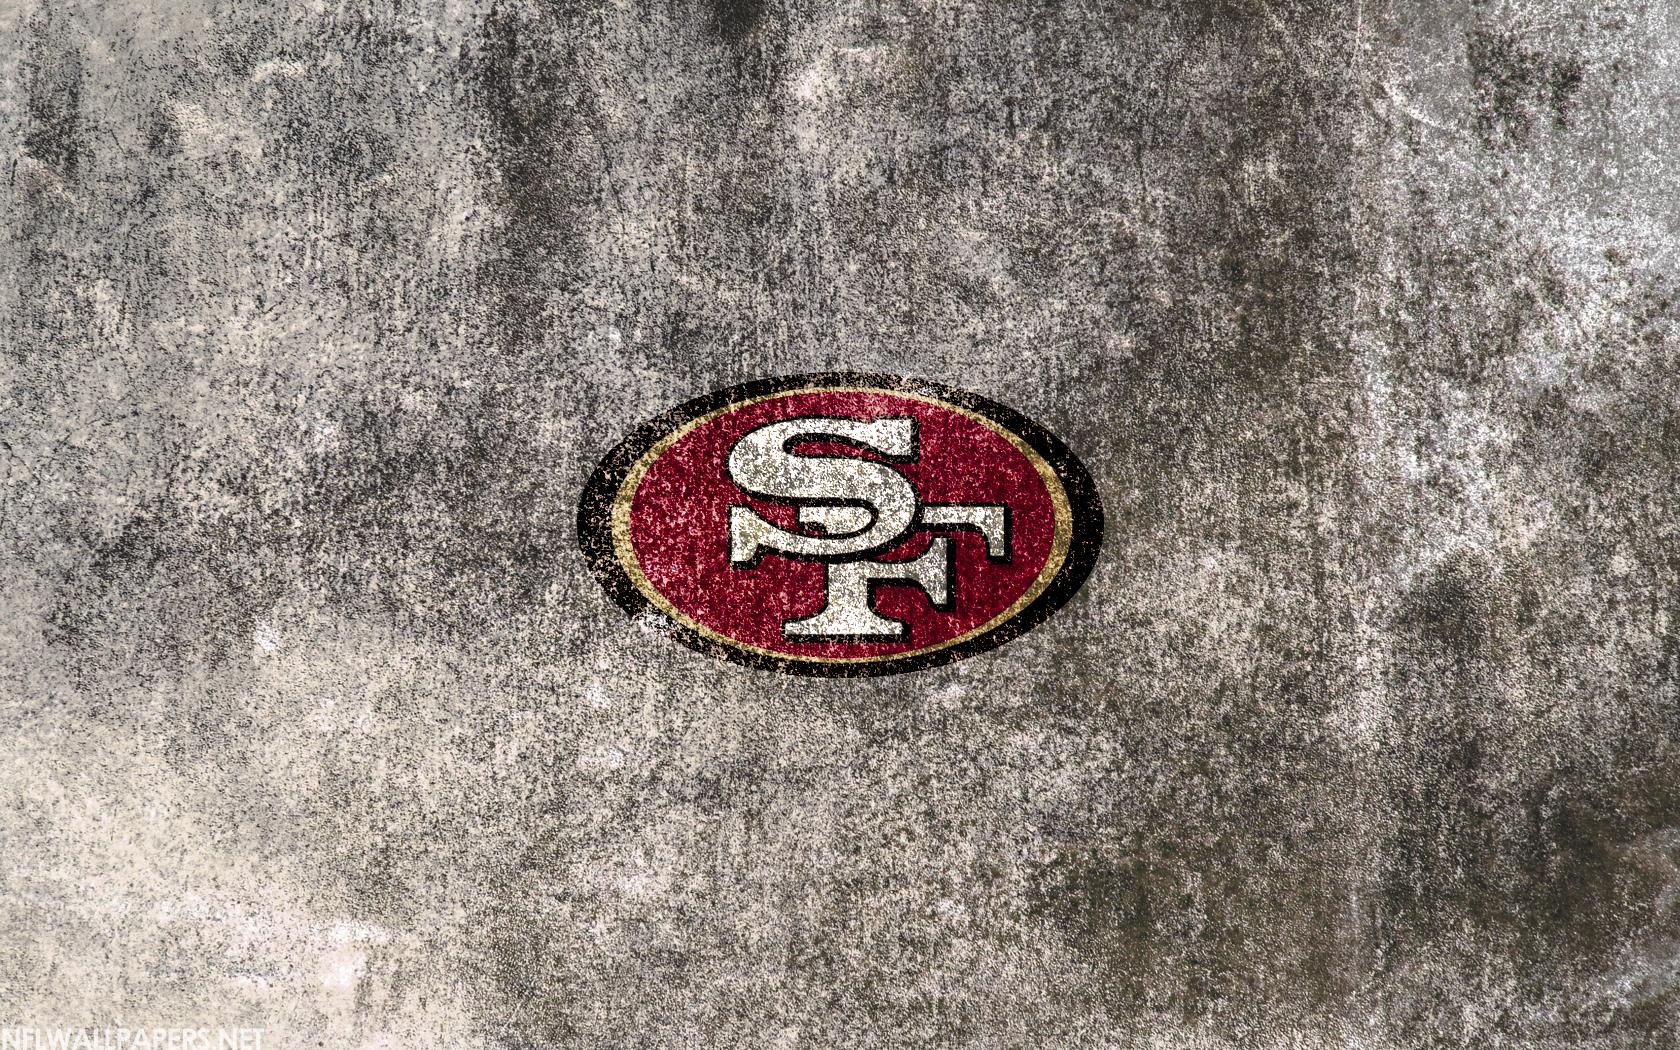 San Francisco 49ers Images · 49ers Wallpaper · 49ers Clip Art · 49ers Football · 49er next Game · 49er Mascot